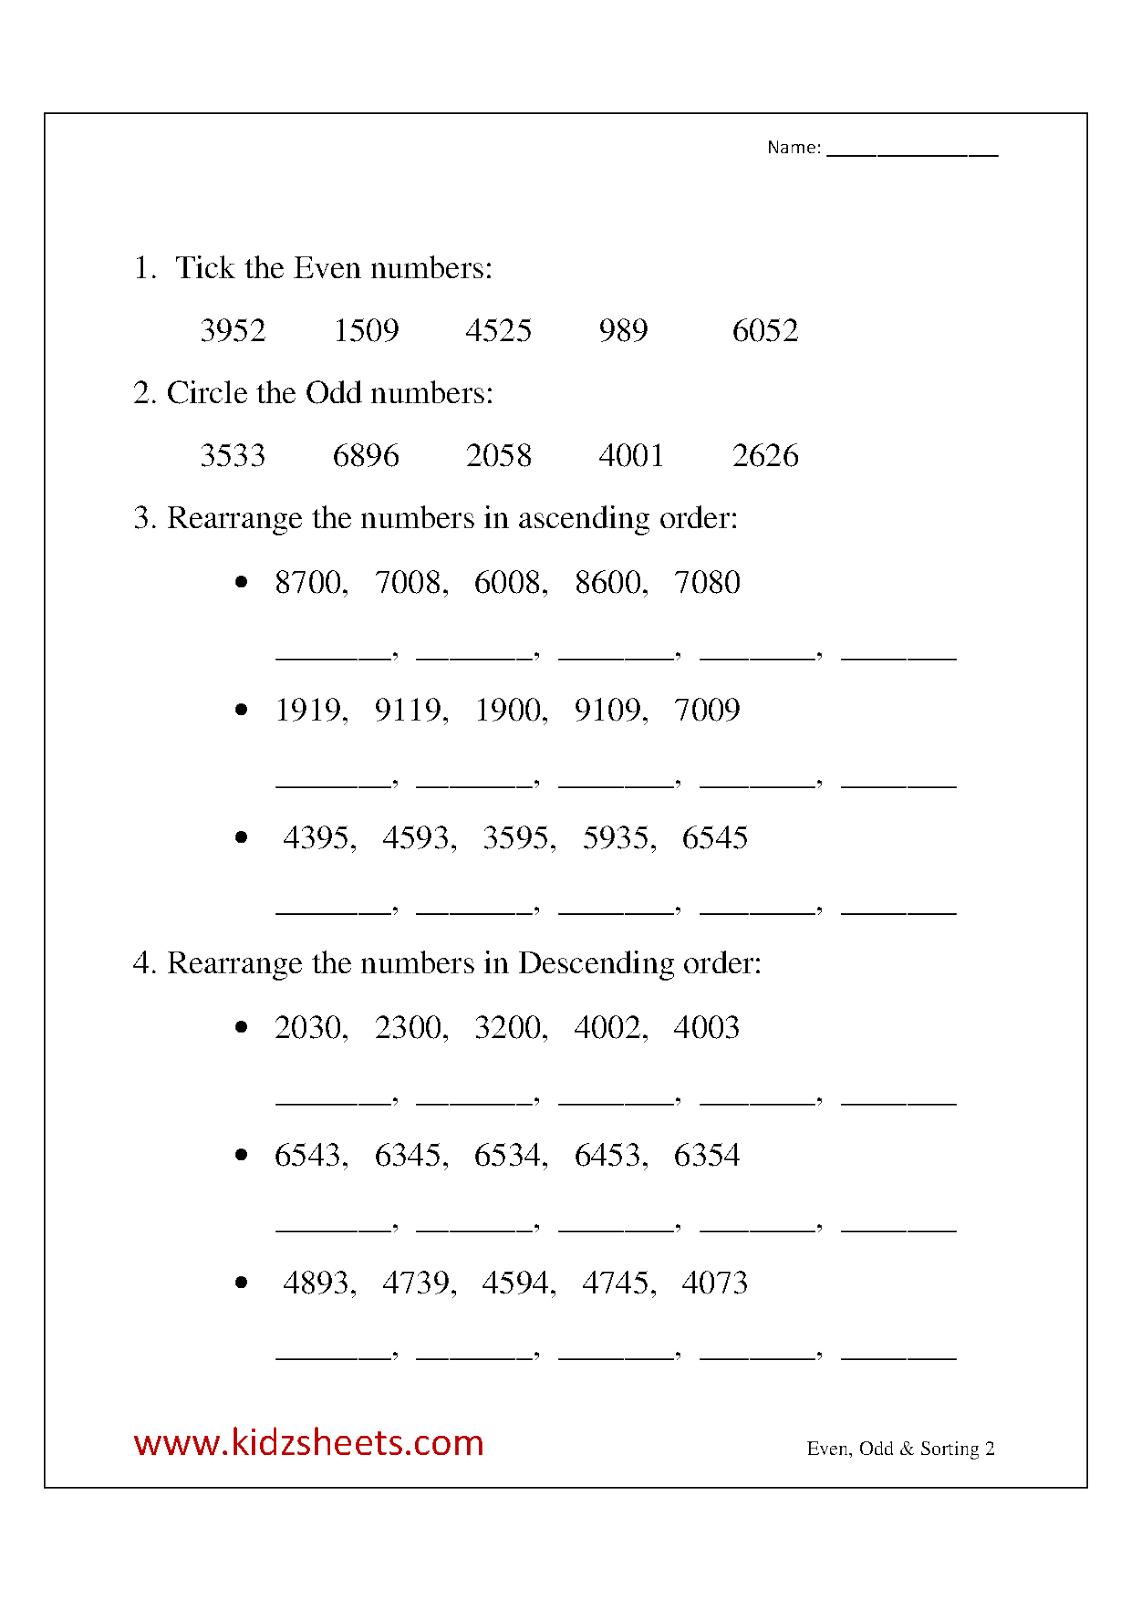 Kidz Worksheets Third Grade Even Odd Amp Sorting Worksheet2